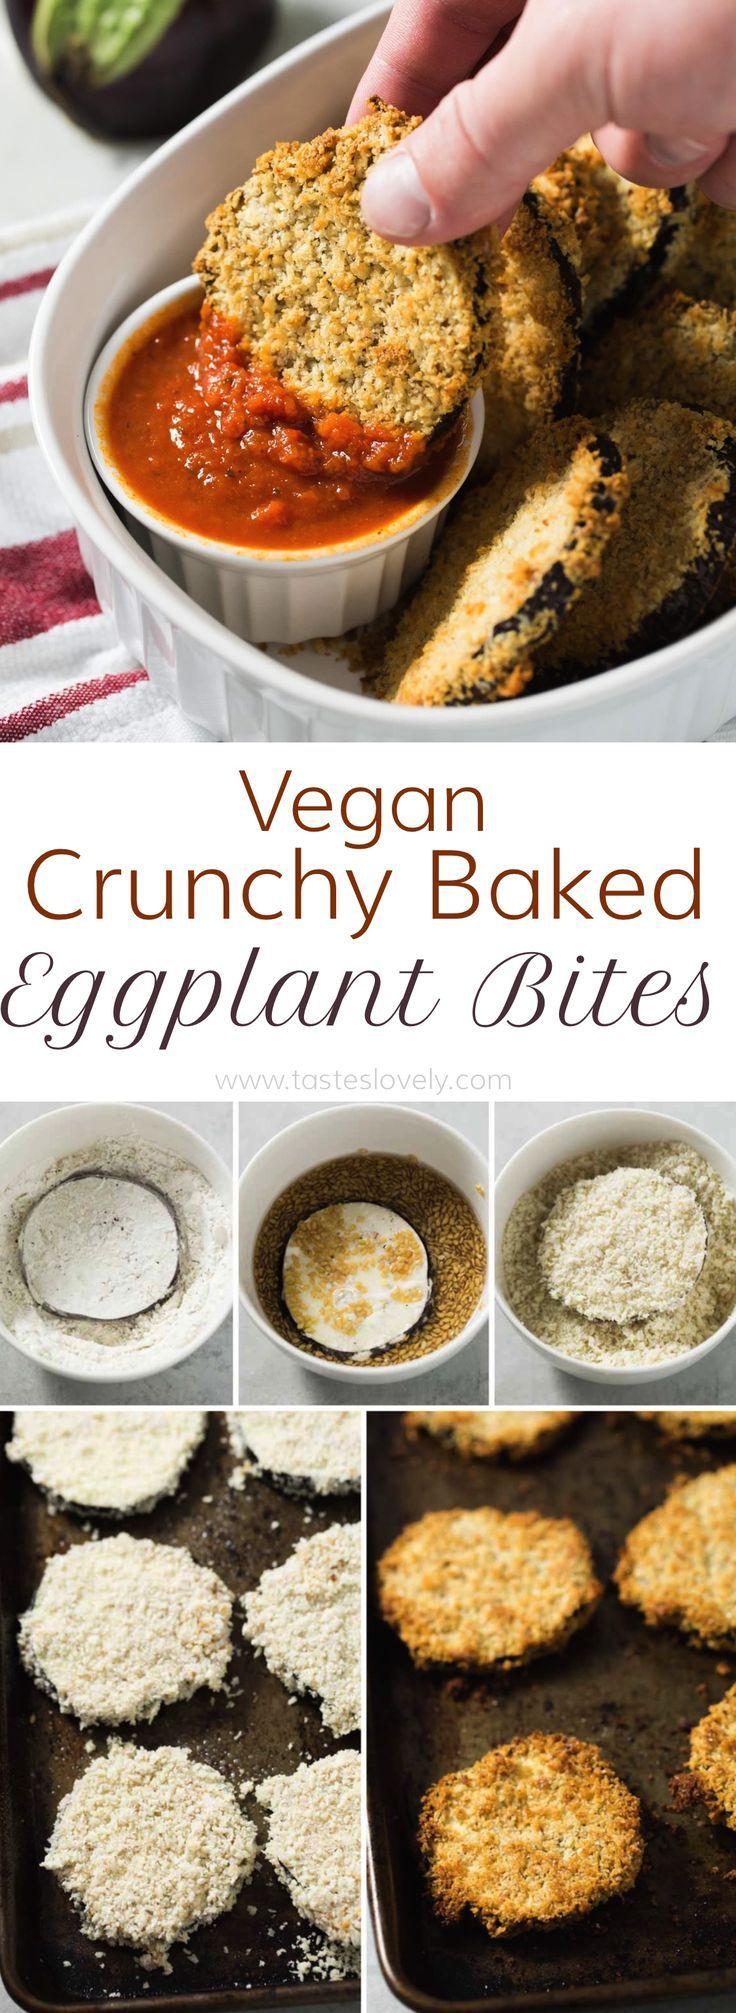 81 best Vegan recipes - eggplant images on Pinterest | Vegetarian ...